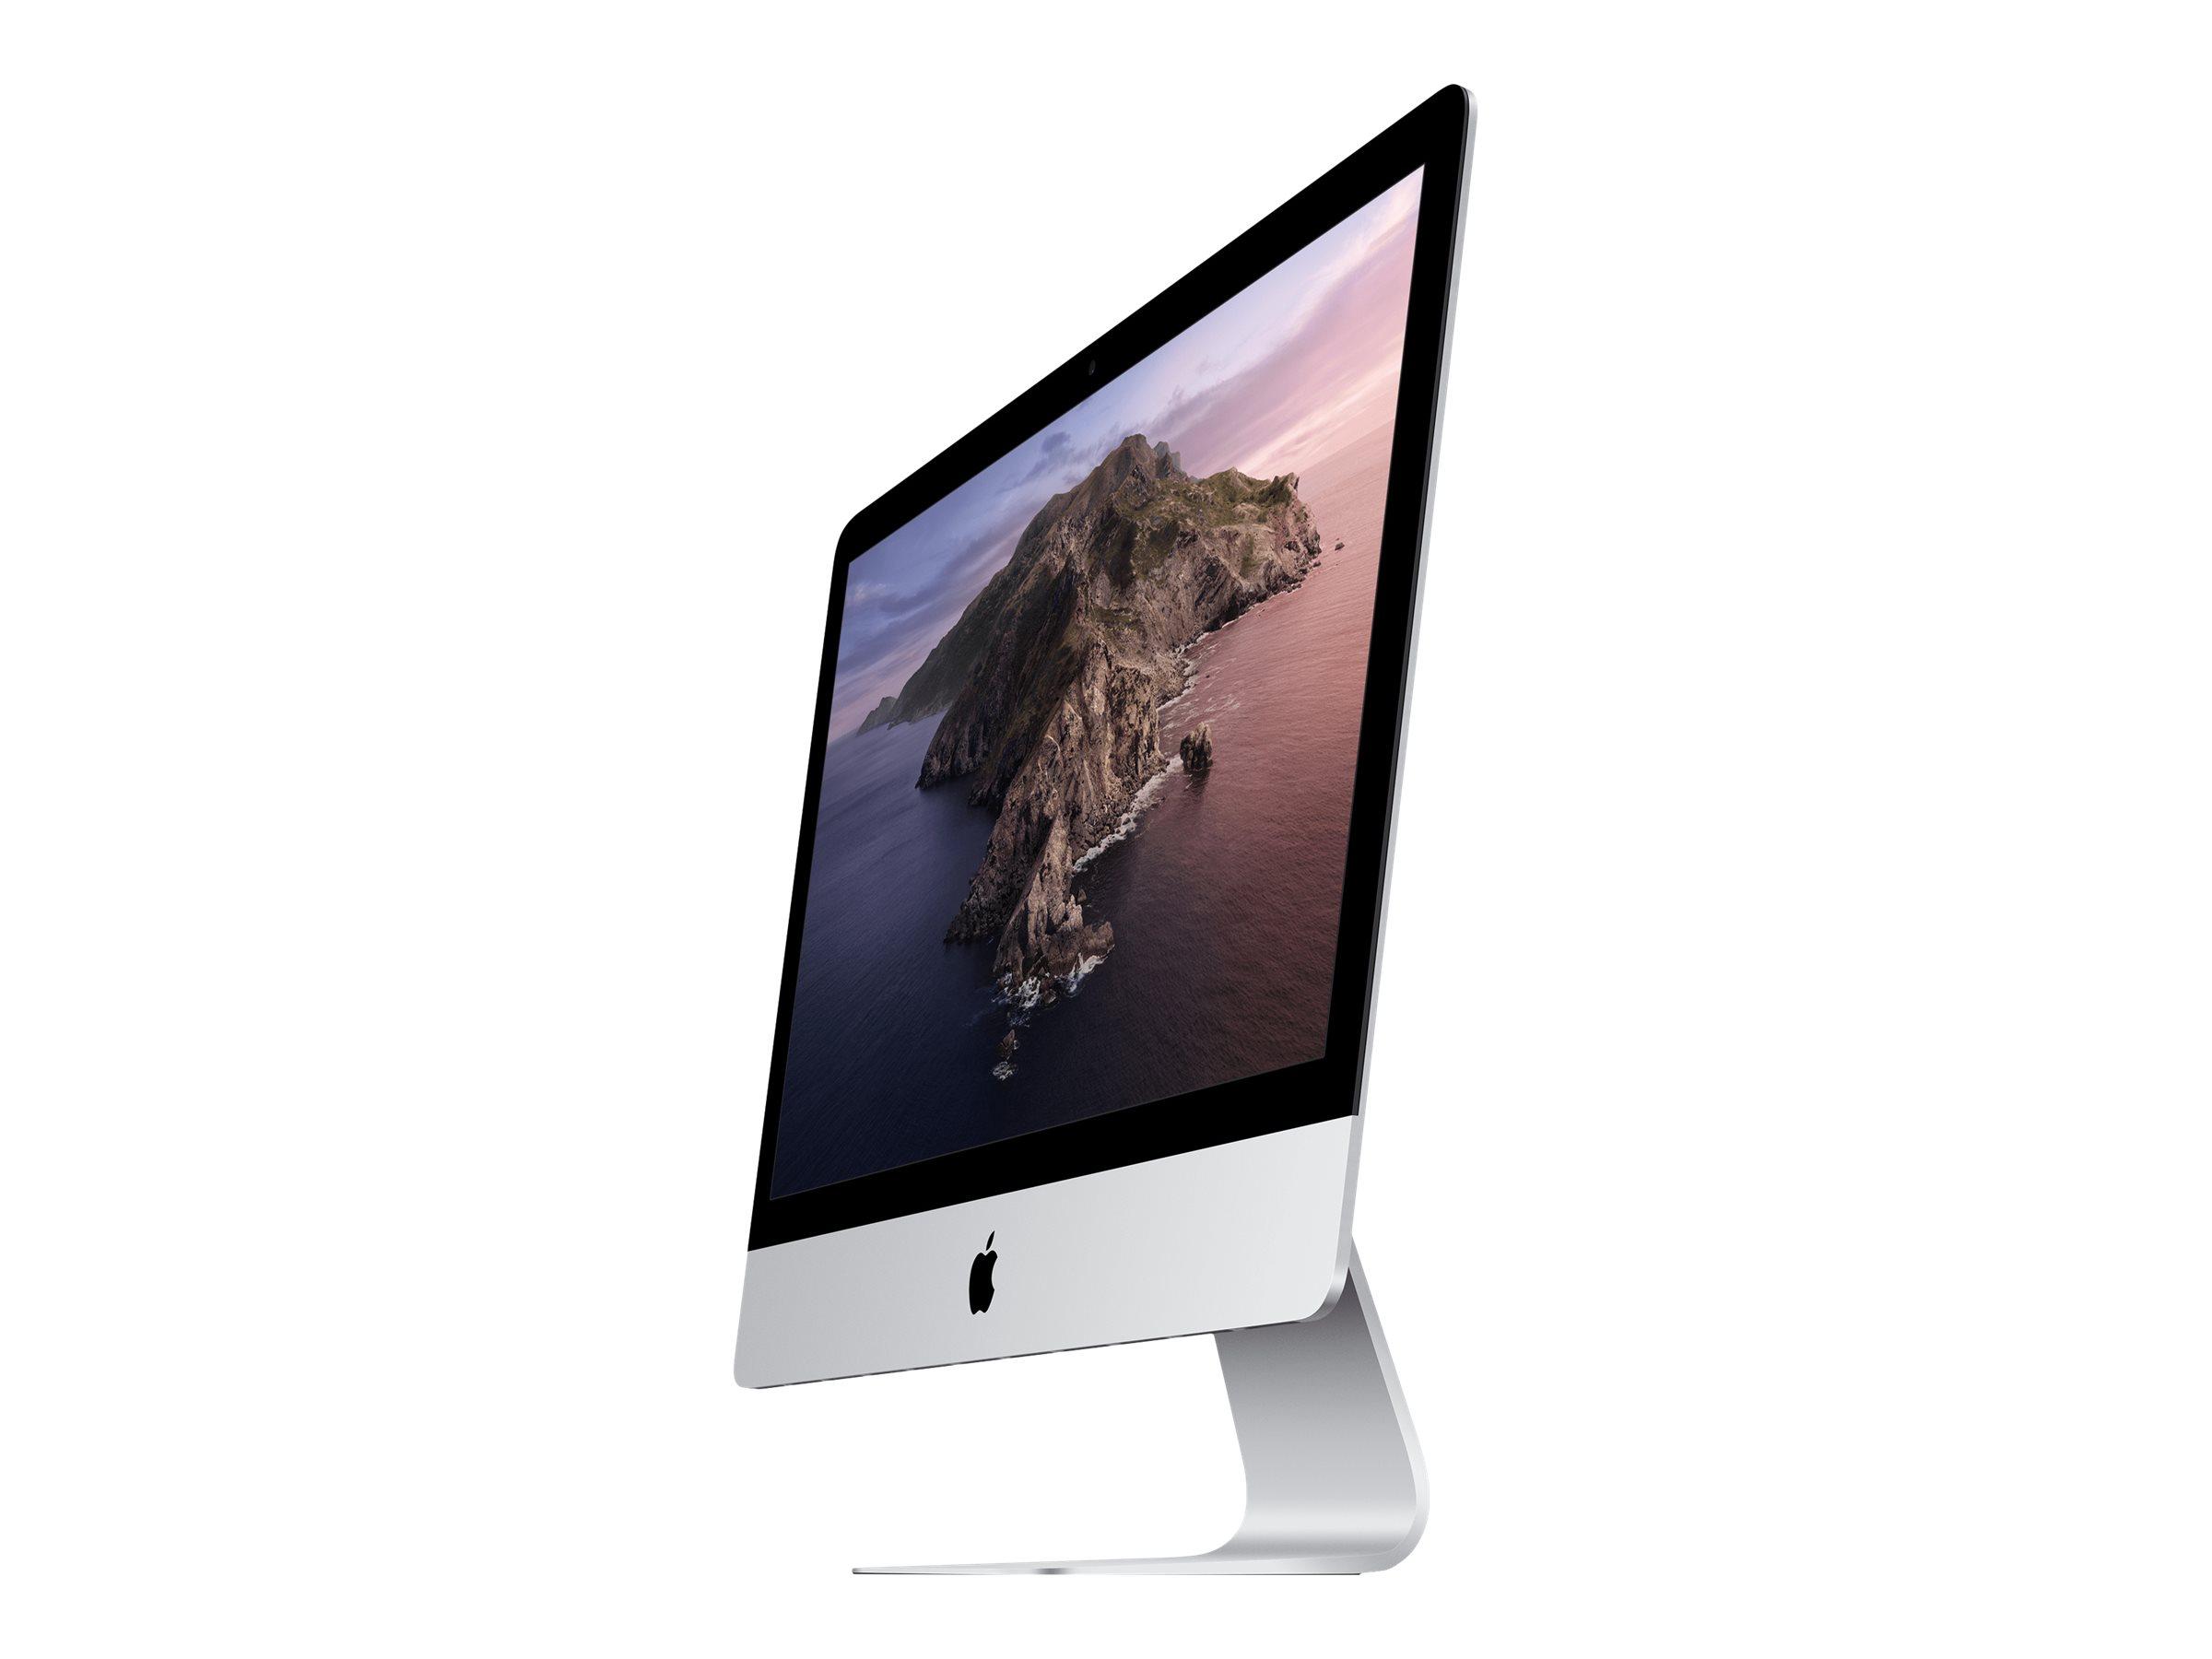 "Vorschau: Apple iMac - All-in-One (Komplettlösung) - Core i5 2.3 GHz - RAM 8 GB - SSD 256 GB - Iris Plus Graphics 640 - GigE - WLAN: 802.11a/b/g/n/ac, Bluetooth 4.2 - macOS Big Sur 11.0 - Monitor: LED 54.6 cm (21.5"")"